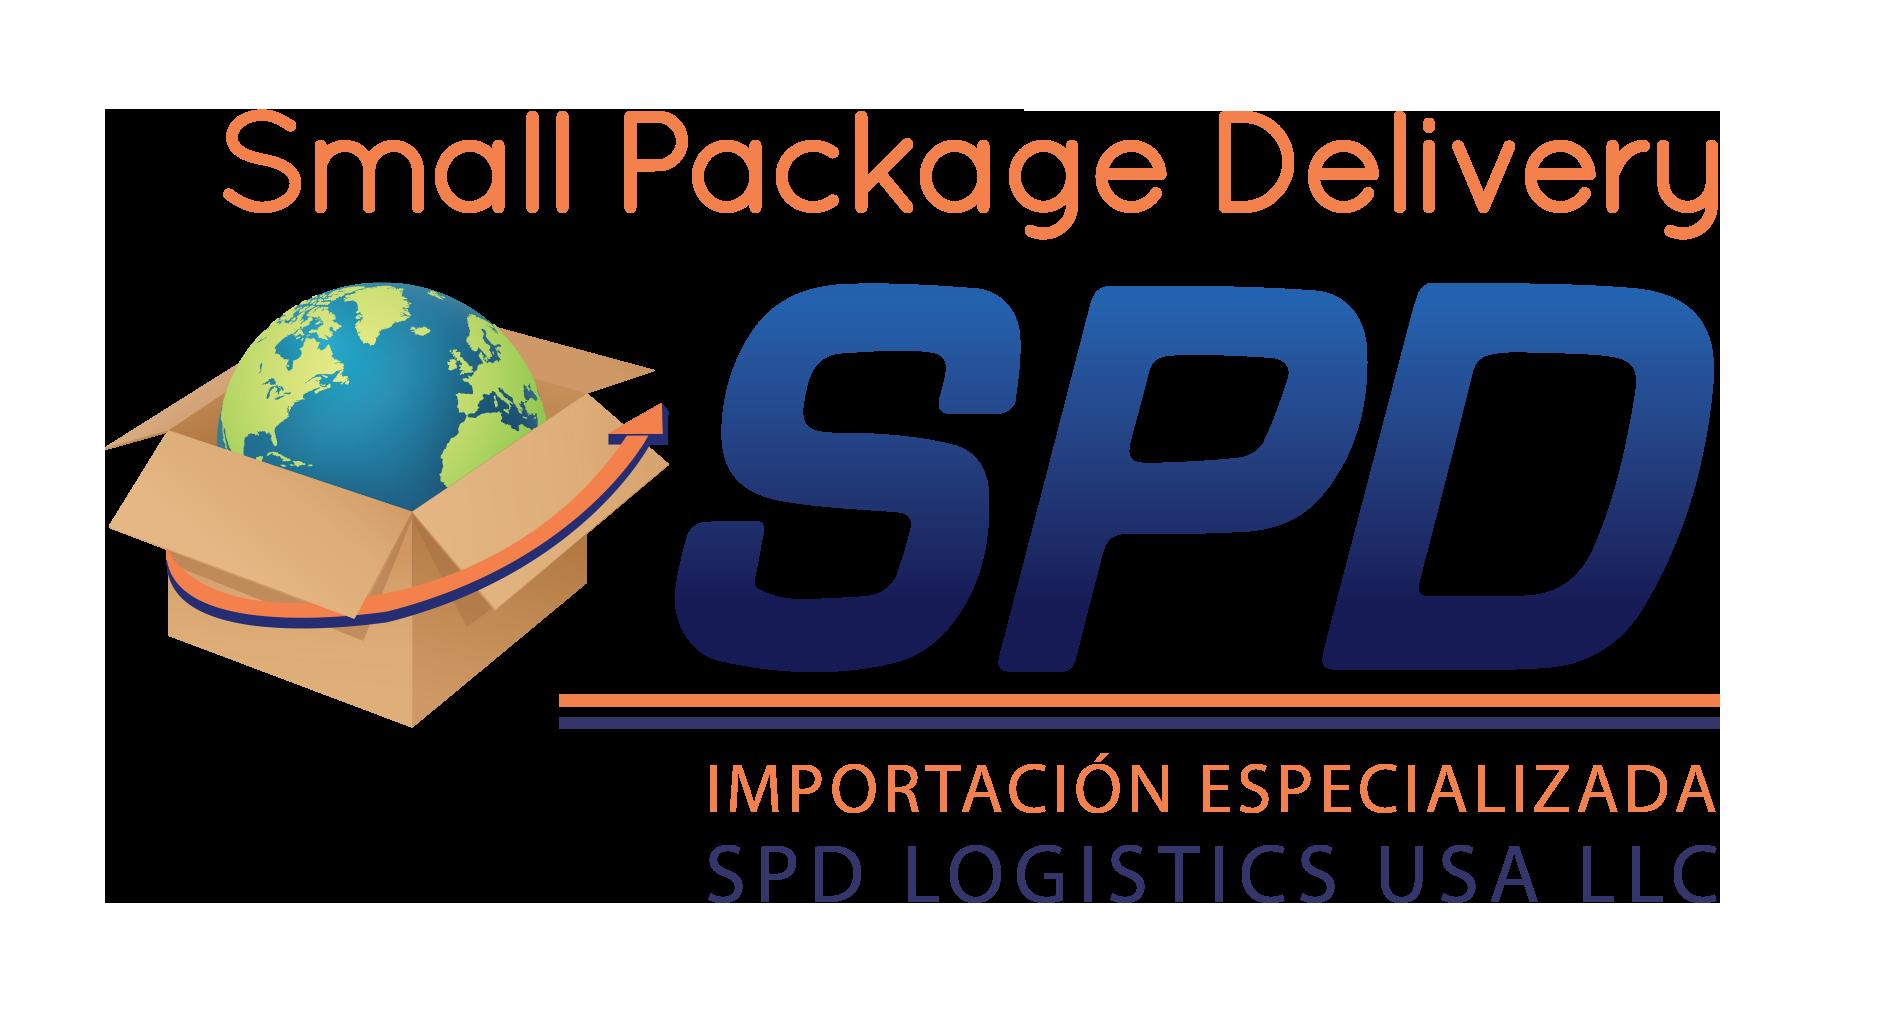 SPD Logistics